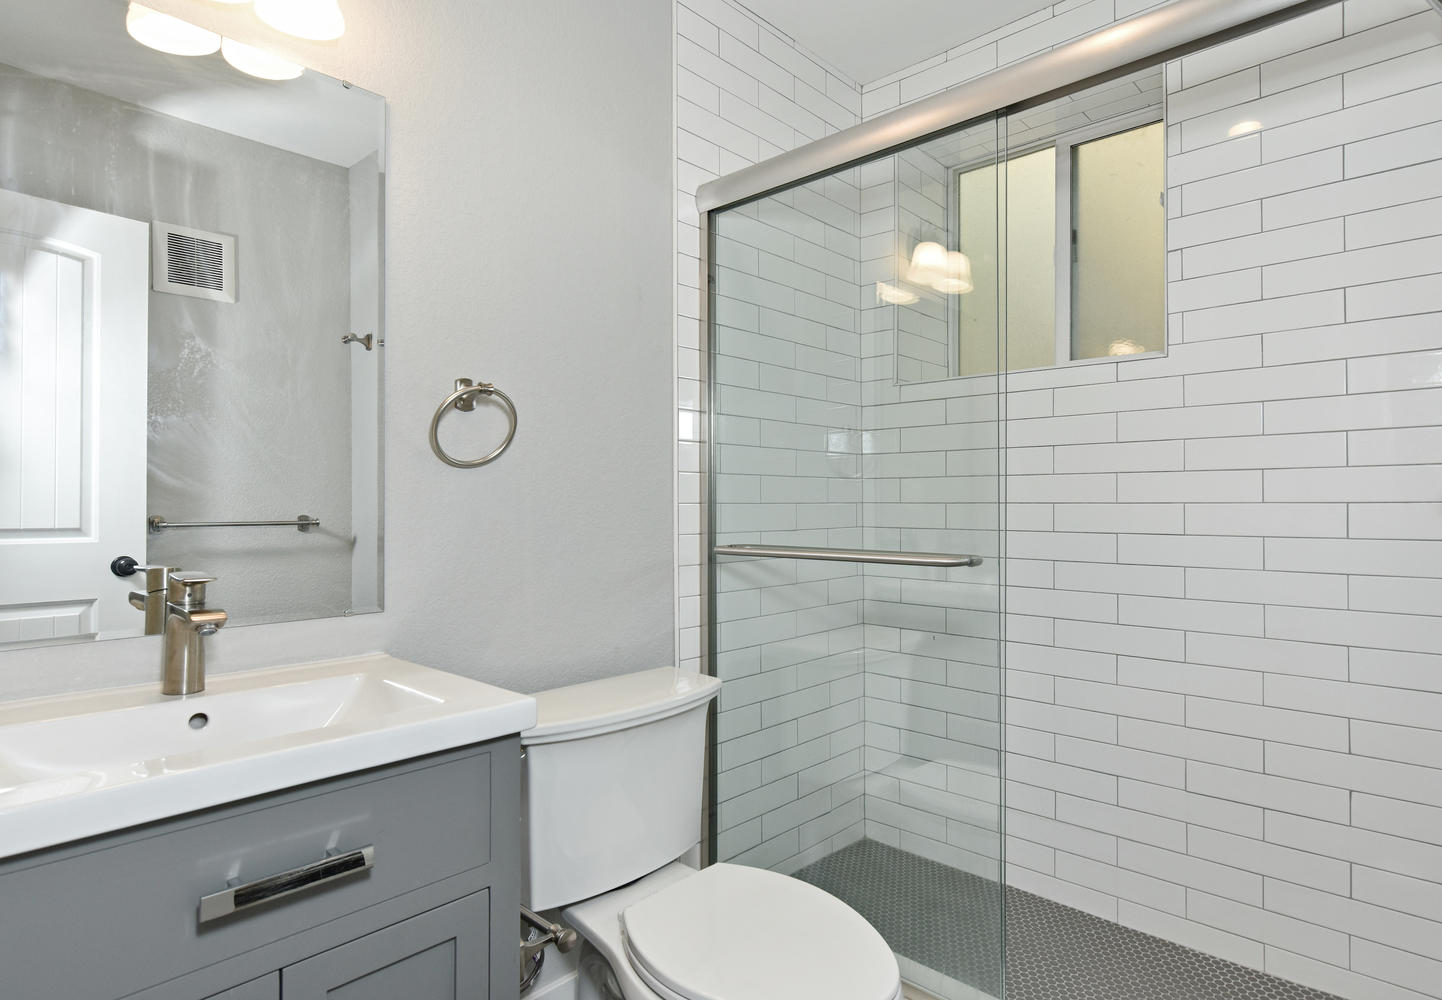 1421 Washington Avenue Golden-large-012-021-C Bathroom-1442x1000-72dpi.jpg